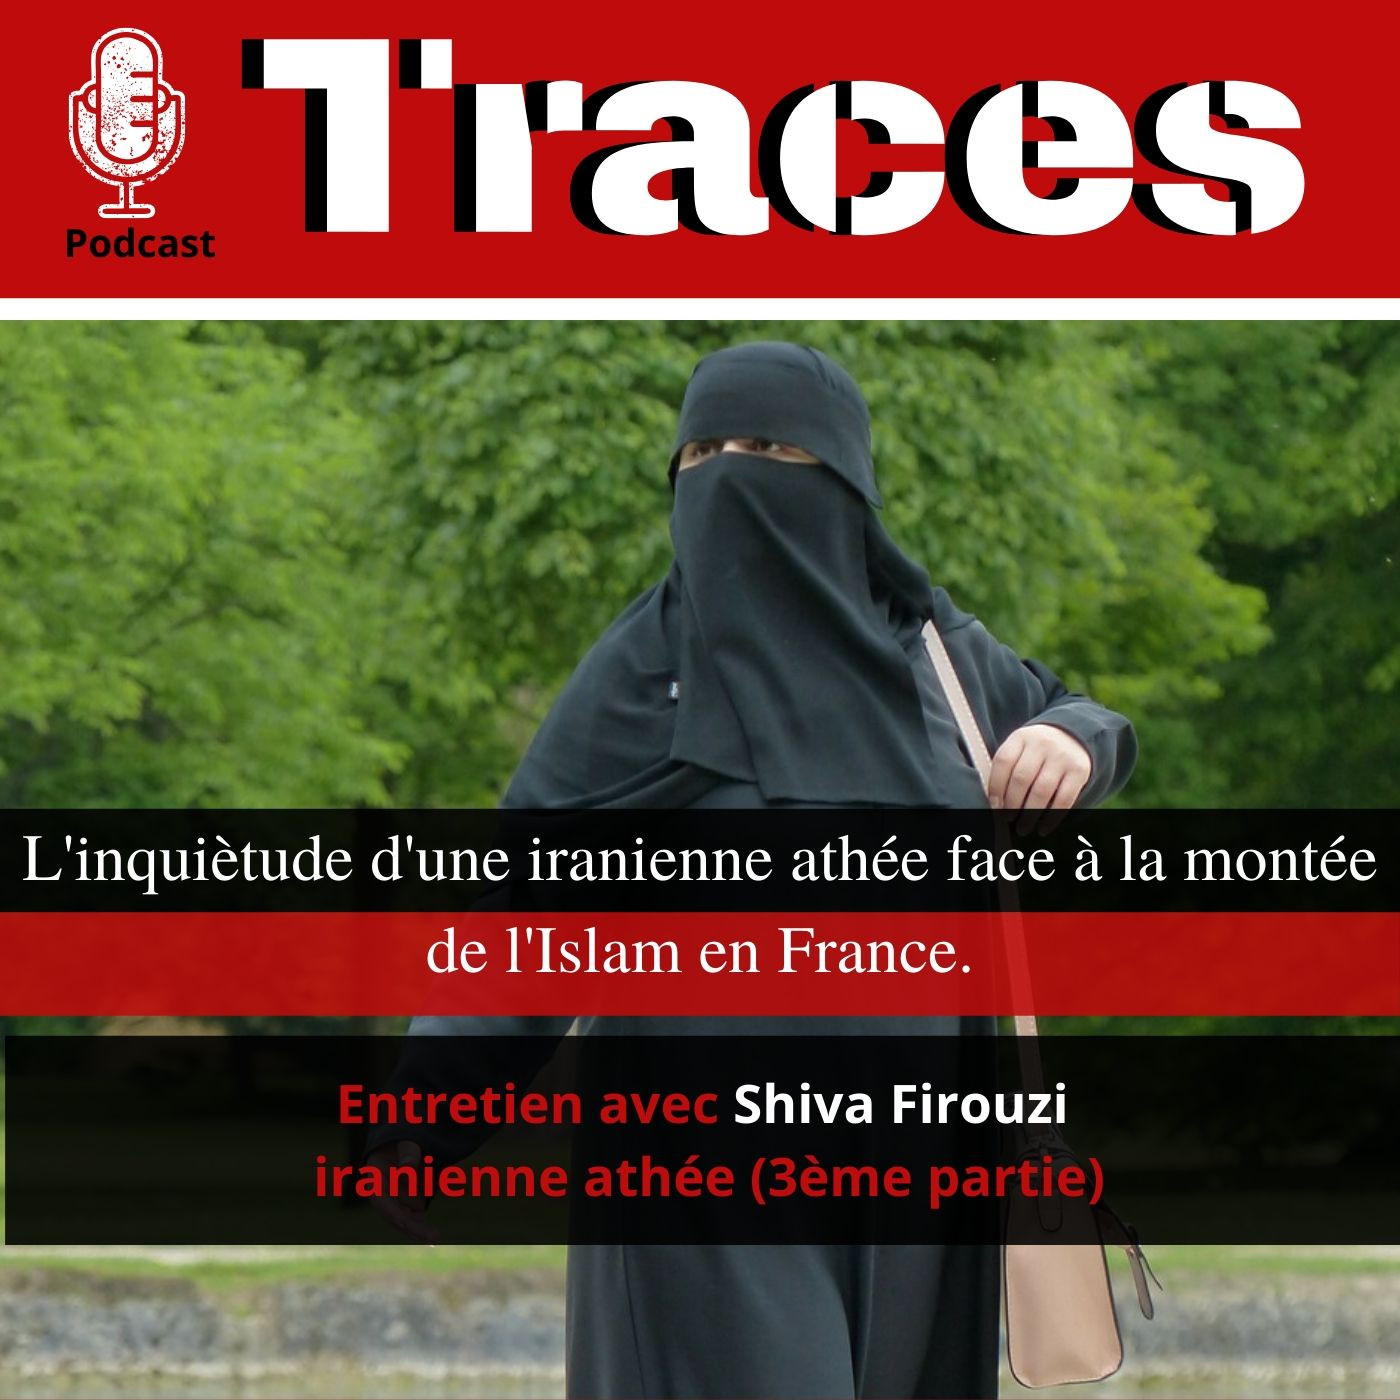 Shiva Firouzi, témoignage d'une iranienne athée (3/3)